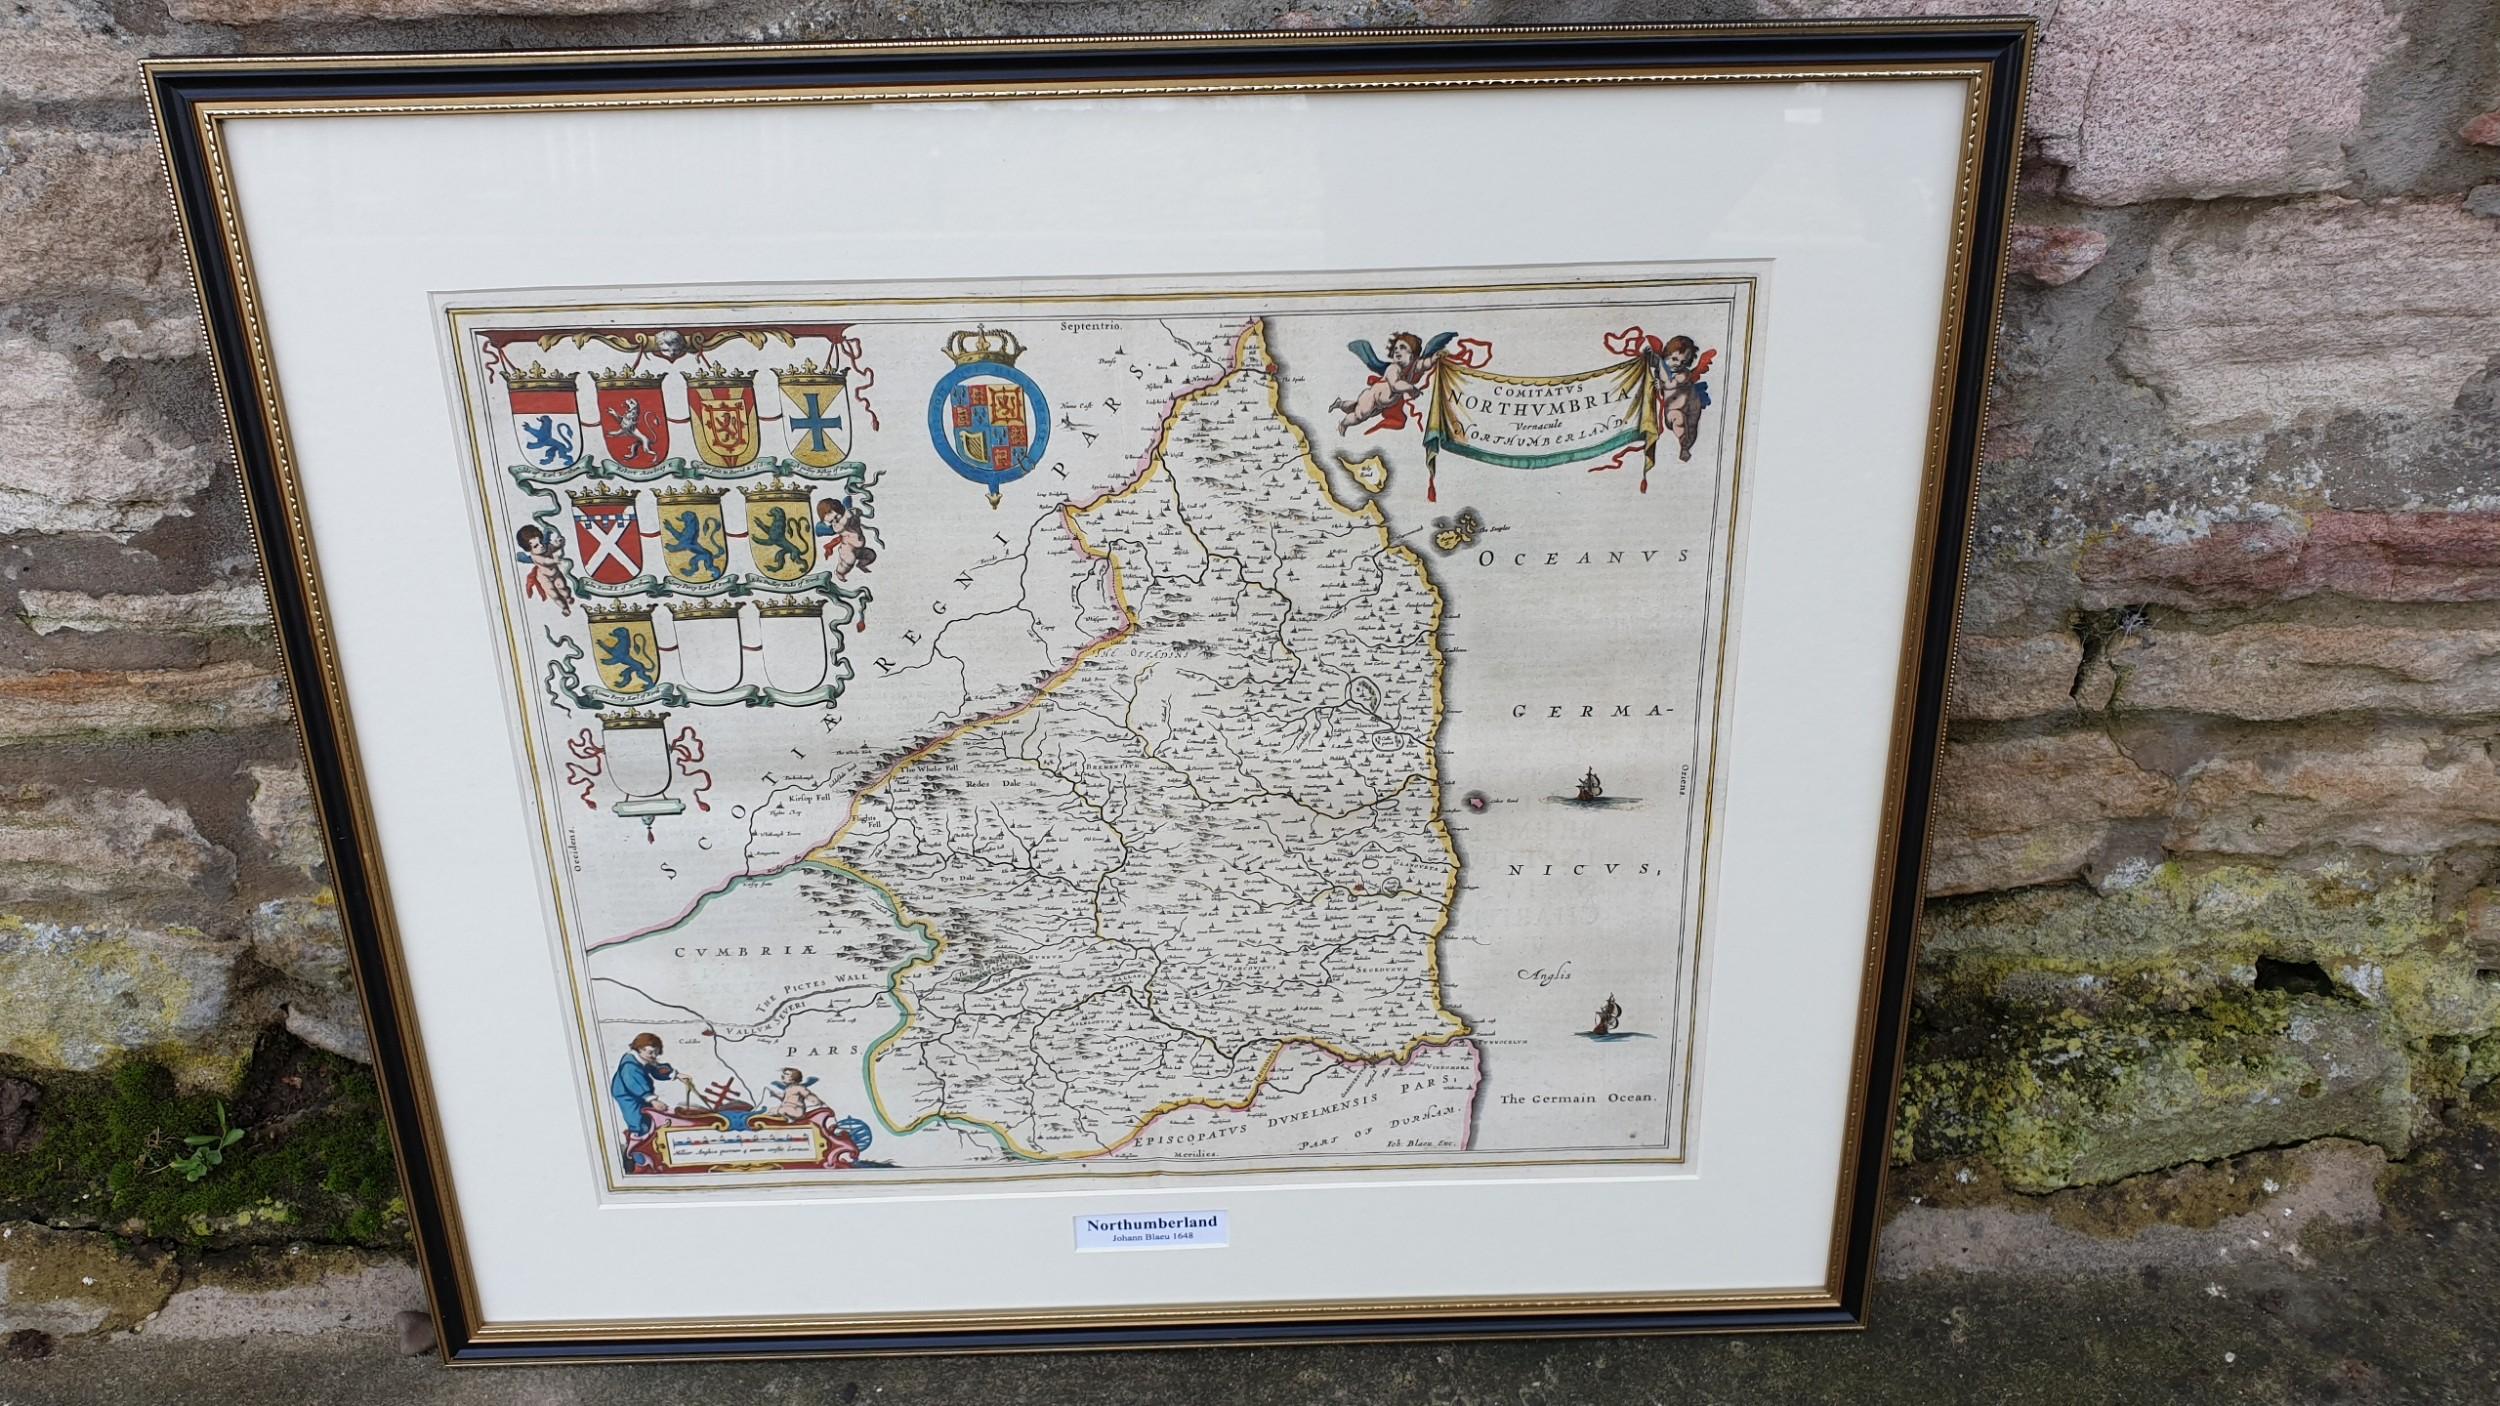 johann blaeu map of northumberland 1648